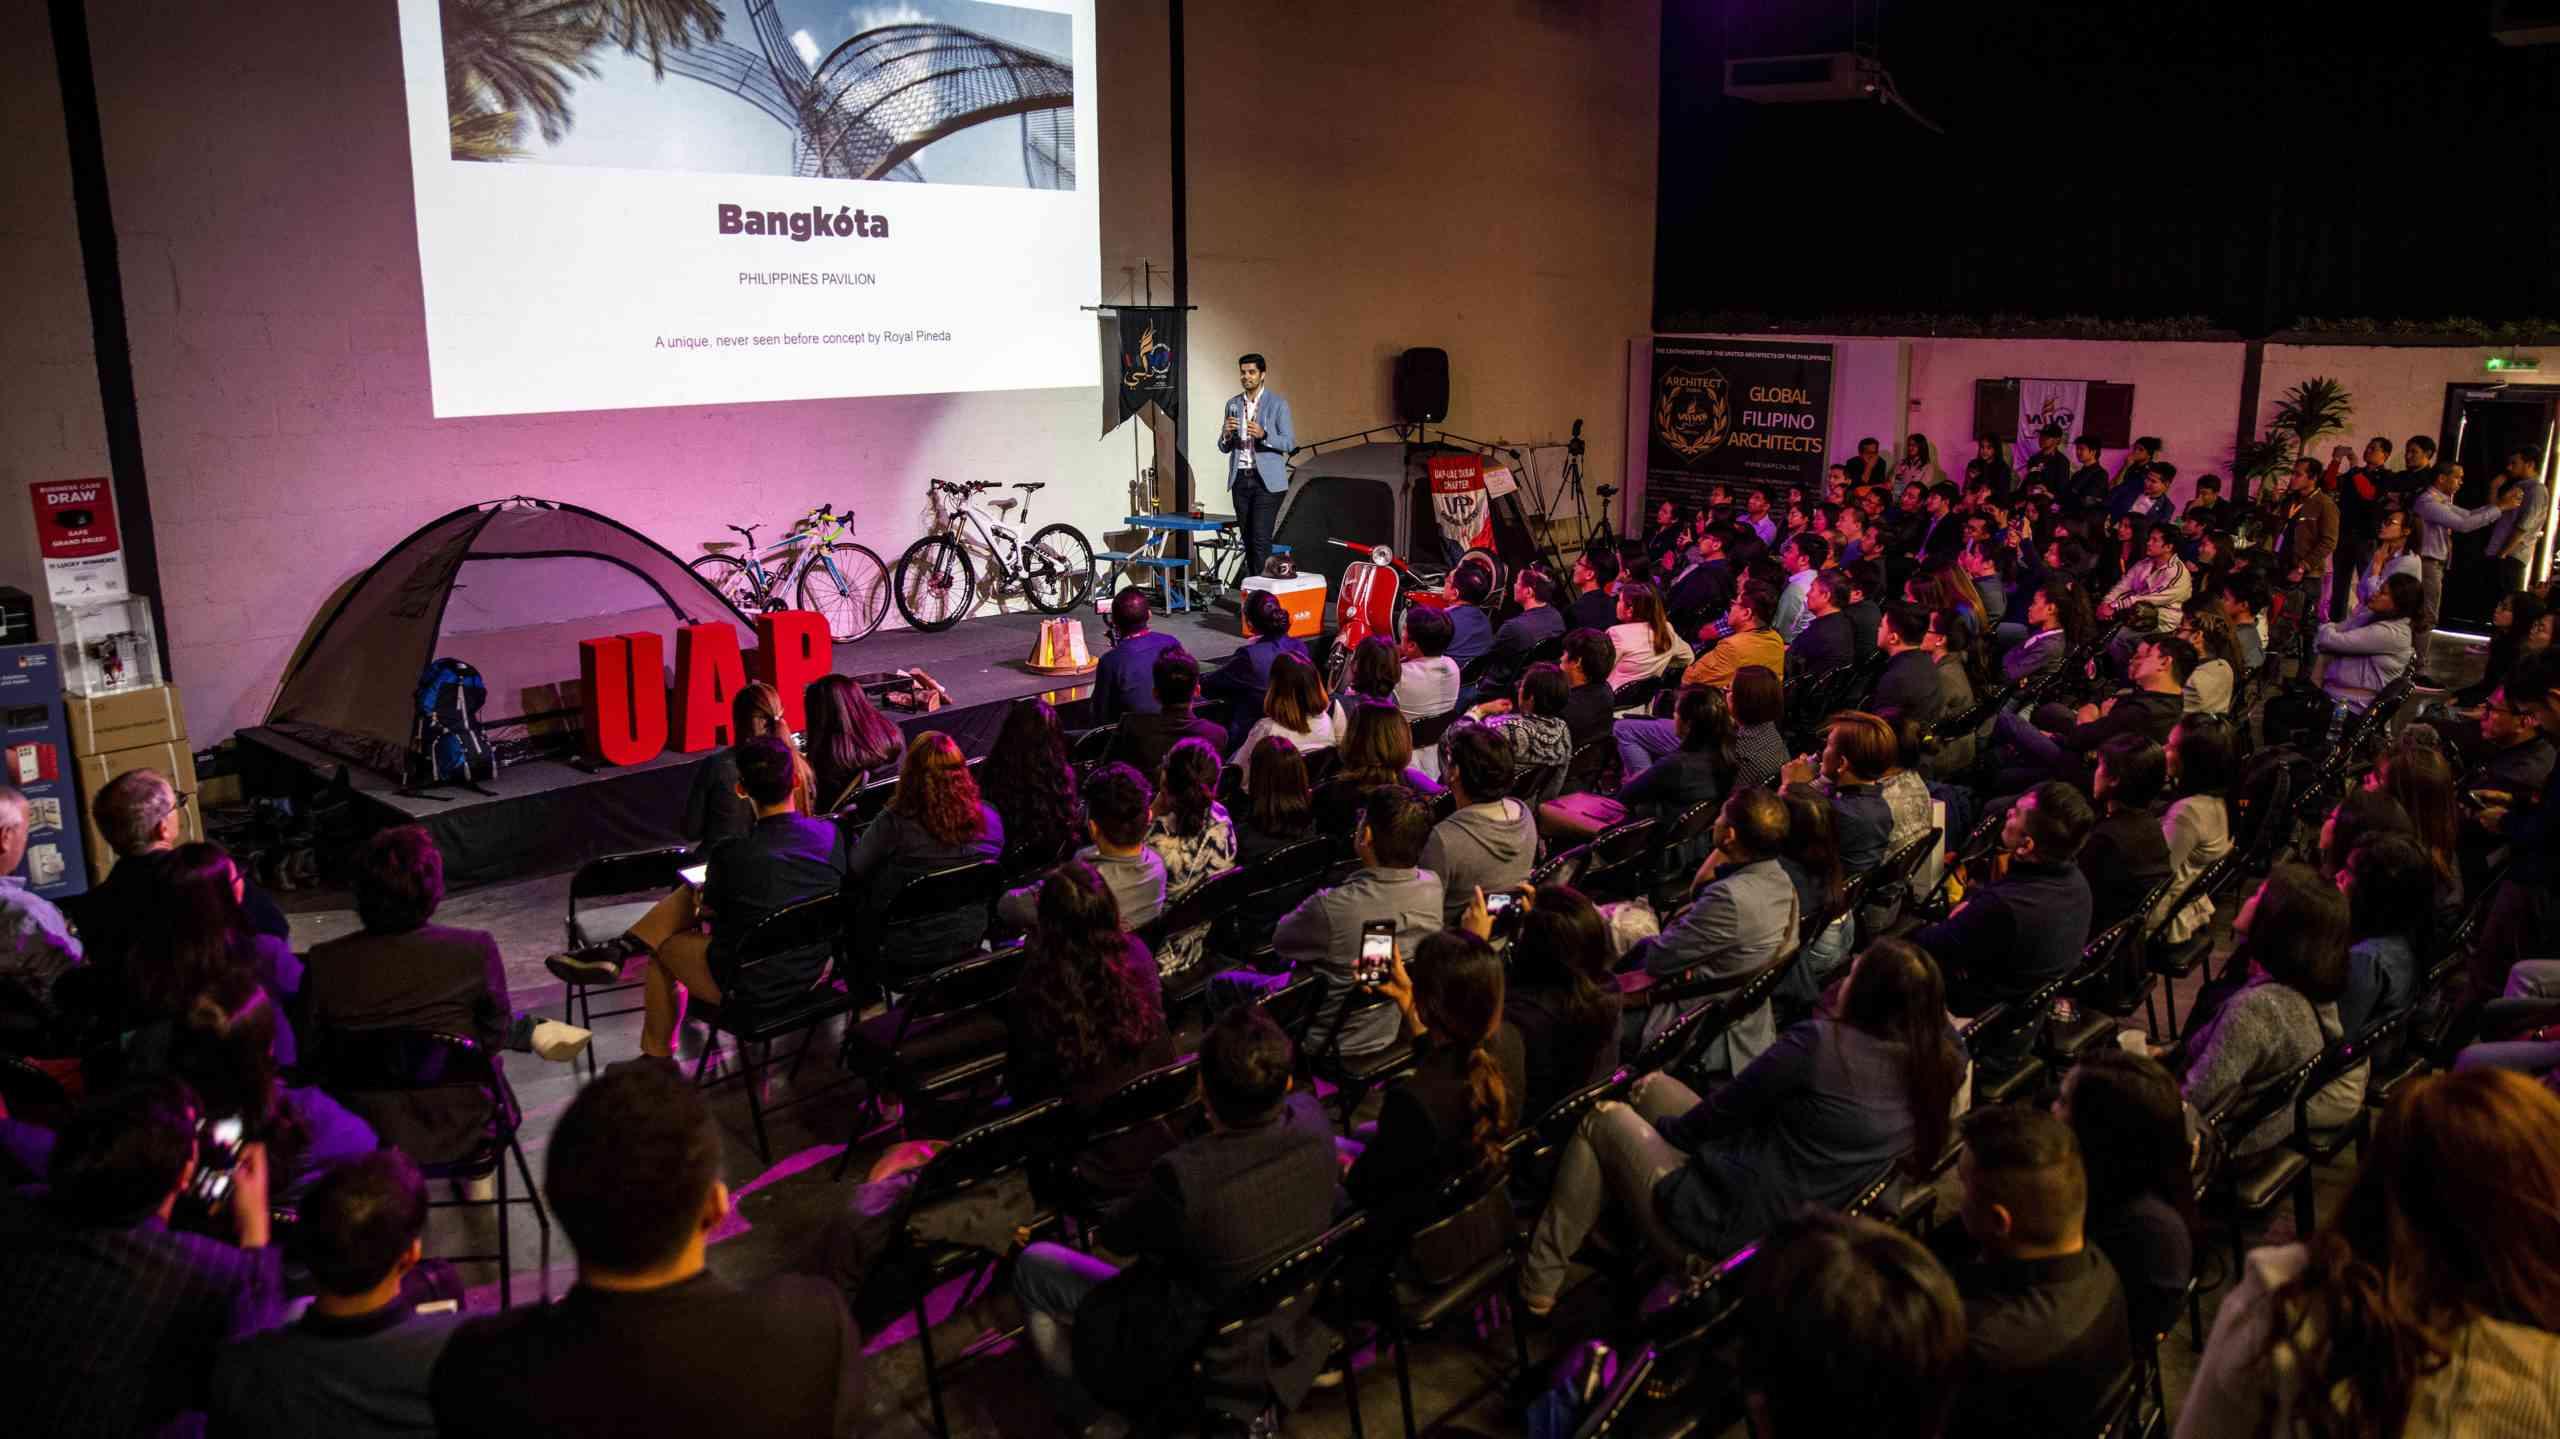 United Architects of Philippines Event at Warehouse Four, Al Quoz, Dubai, United Arab Emirates - Mustafa Kandori on stage presenting the opening arguments